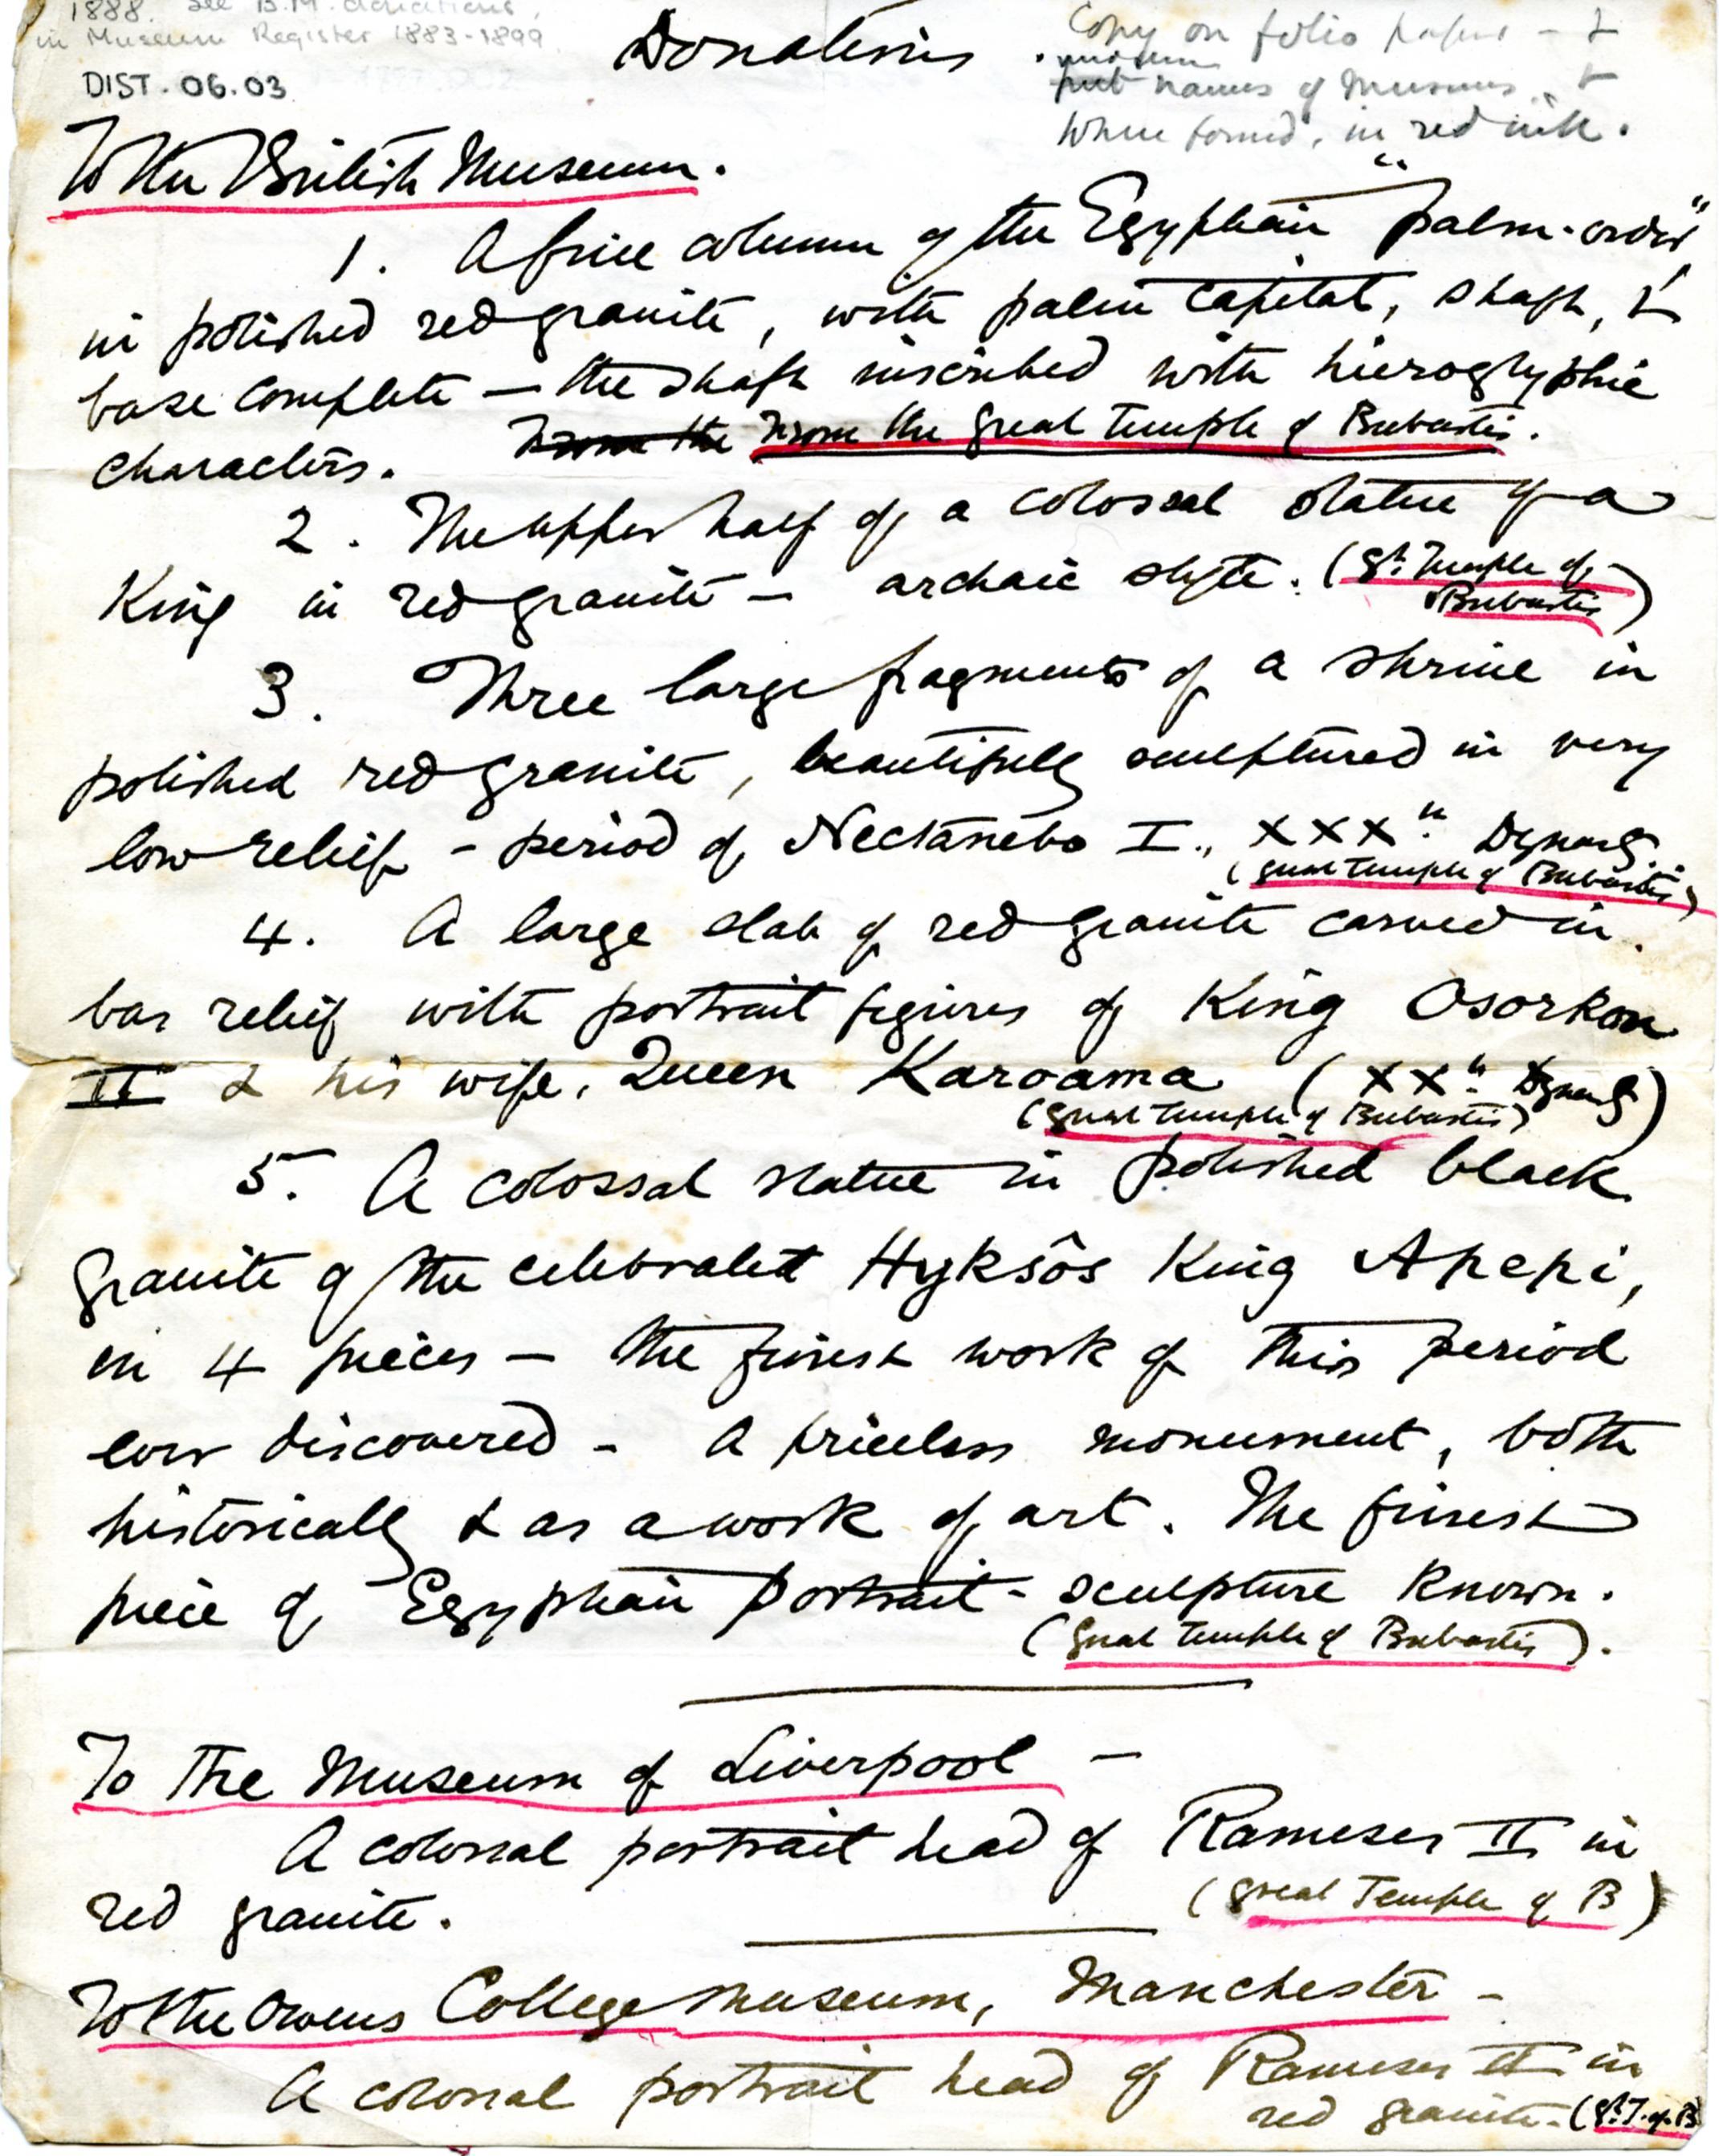 1887-1889 Tell el-Yahudiya, Teranneh, Heliopolis, Bubastis DIST.06.03a